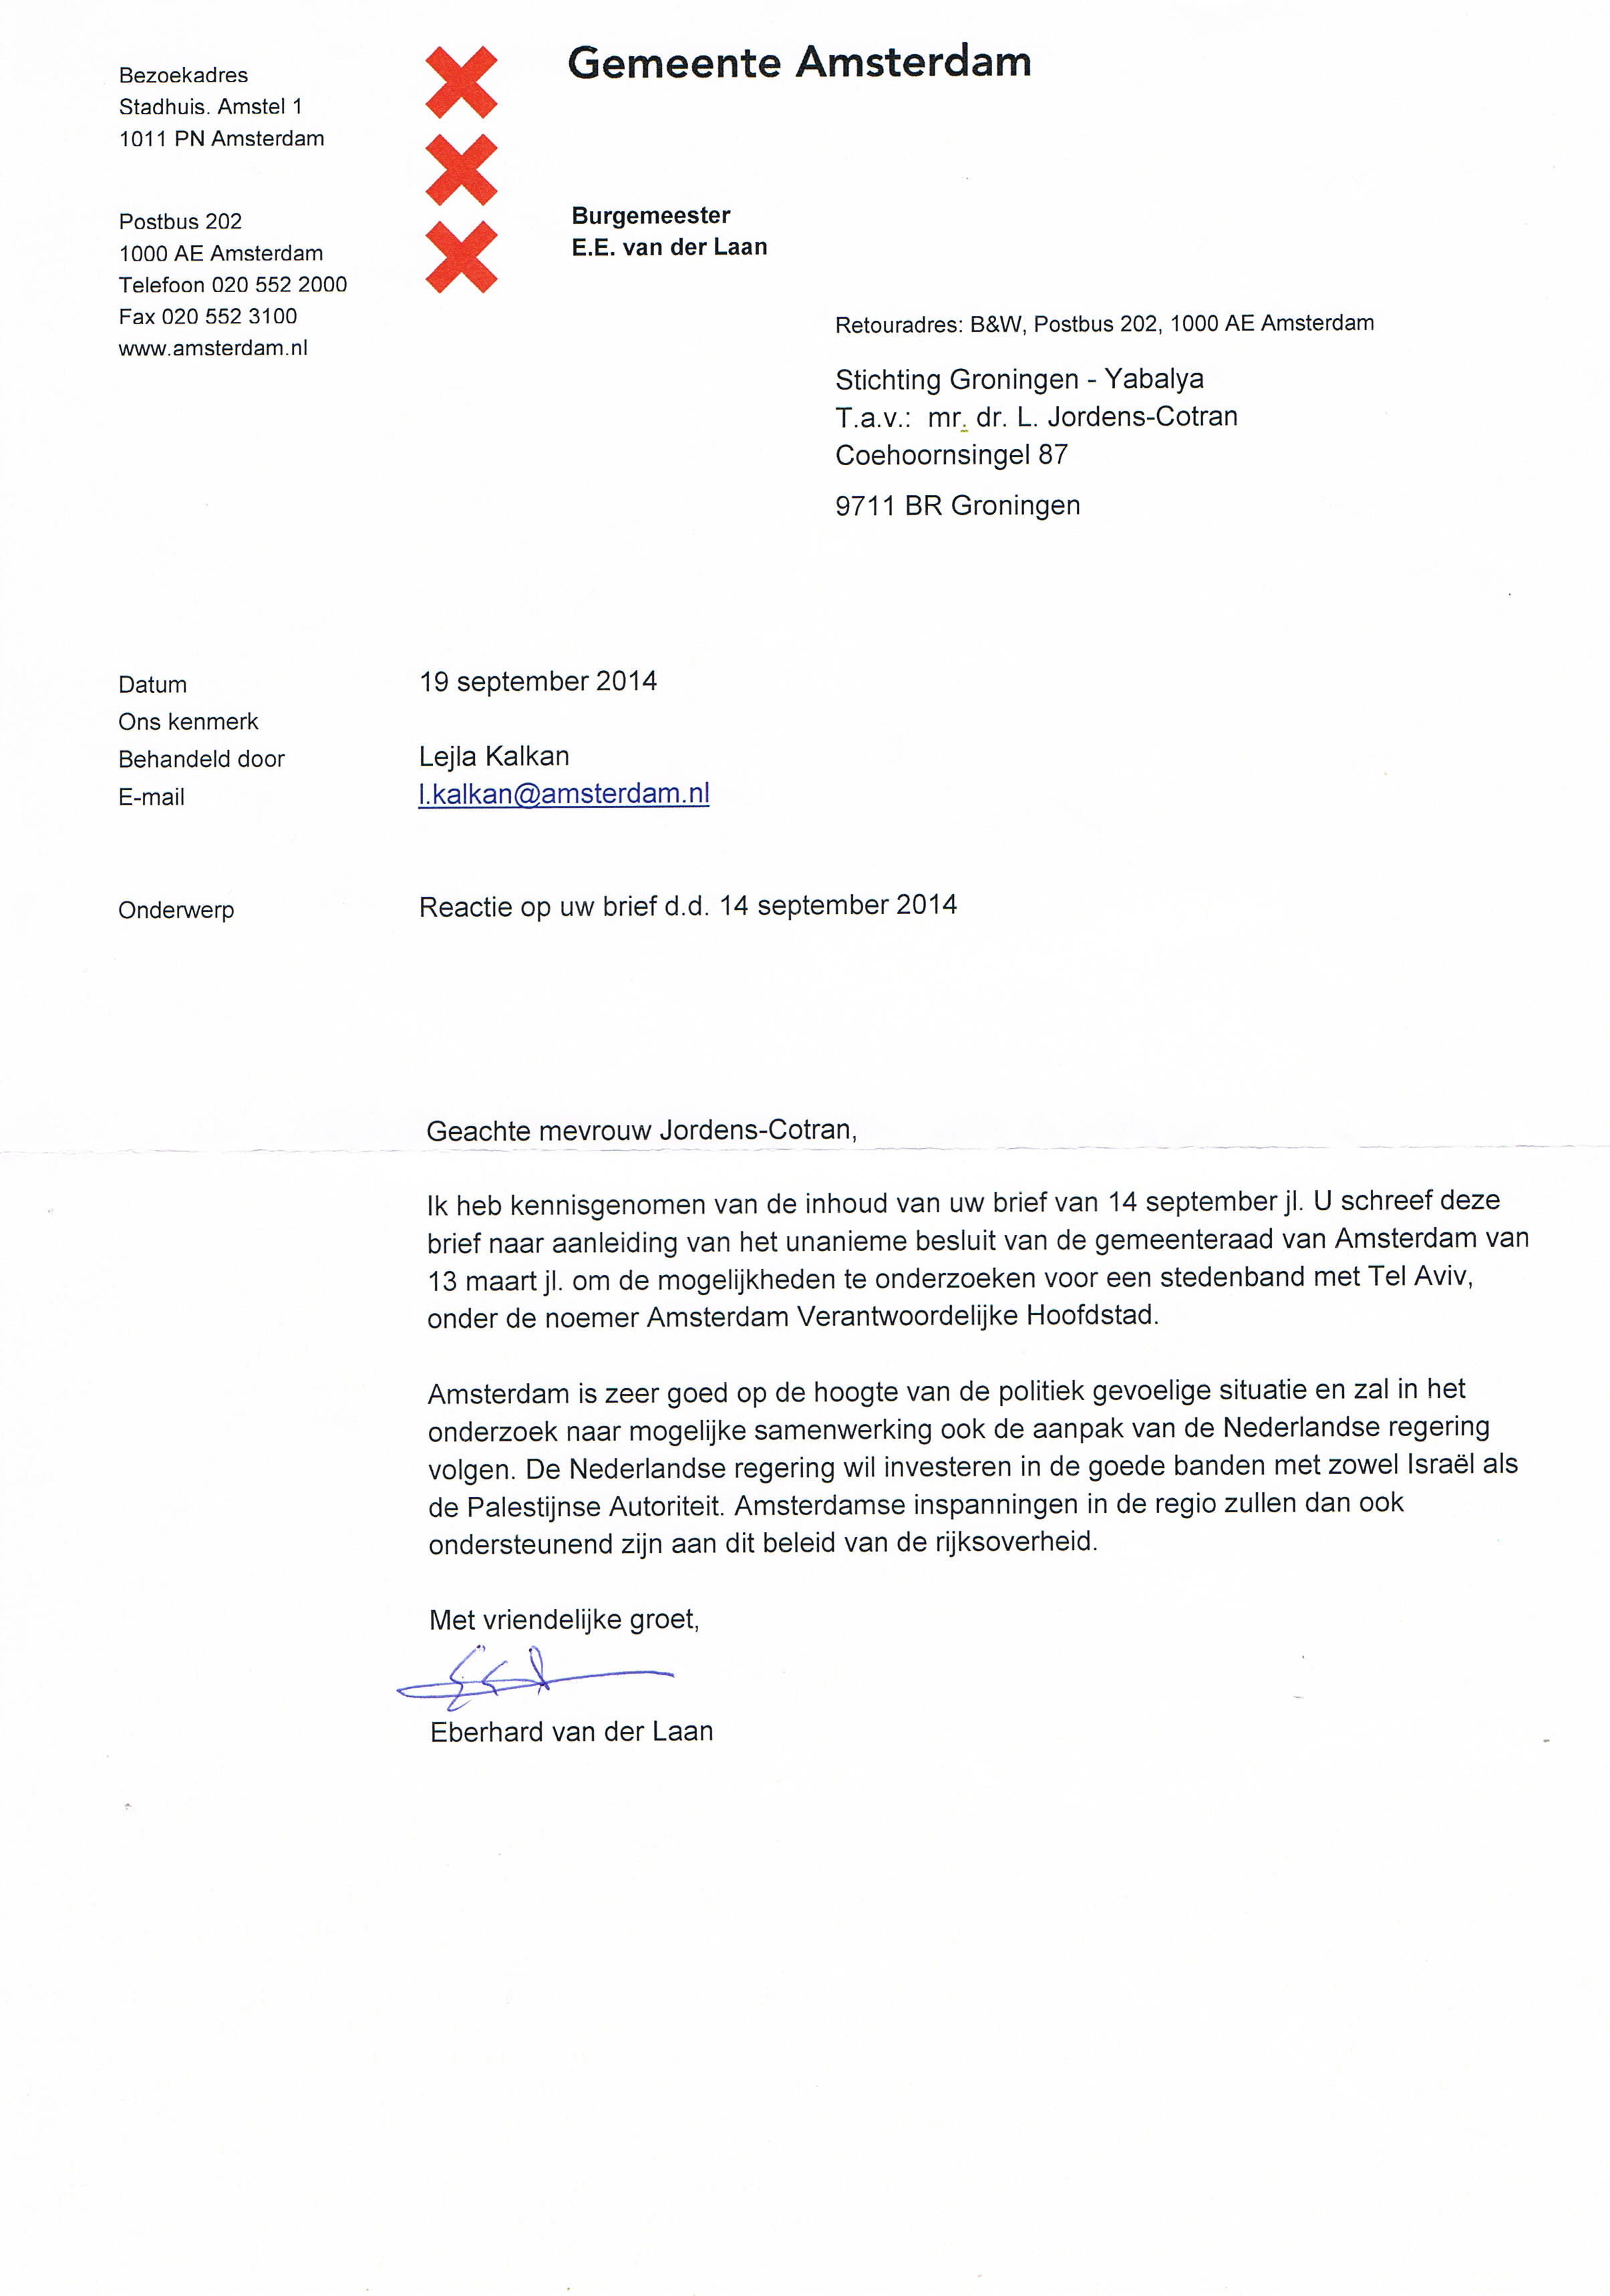 brief aan gemeenteraad voorbeeld Brief Aan Gemeenteraad Voorbeeld | gantinova